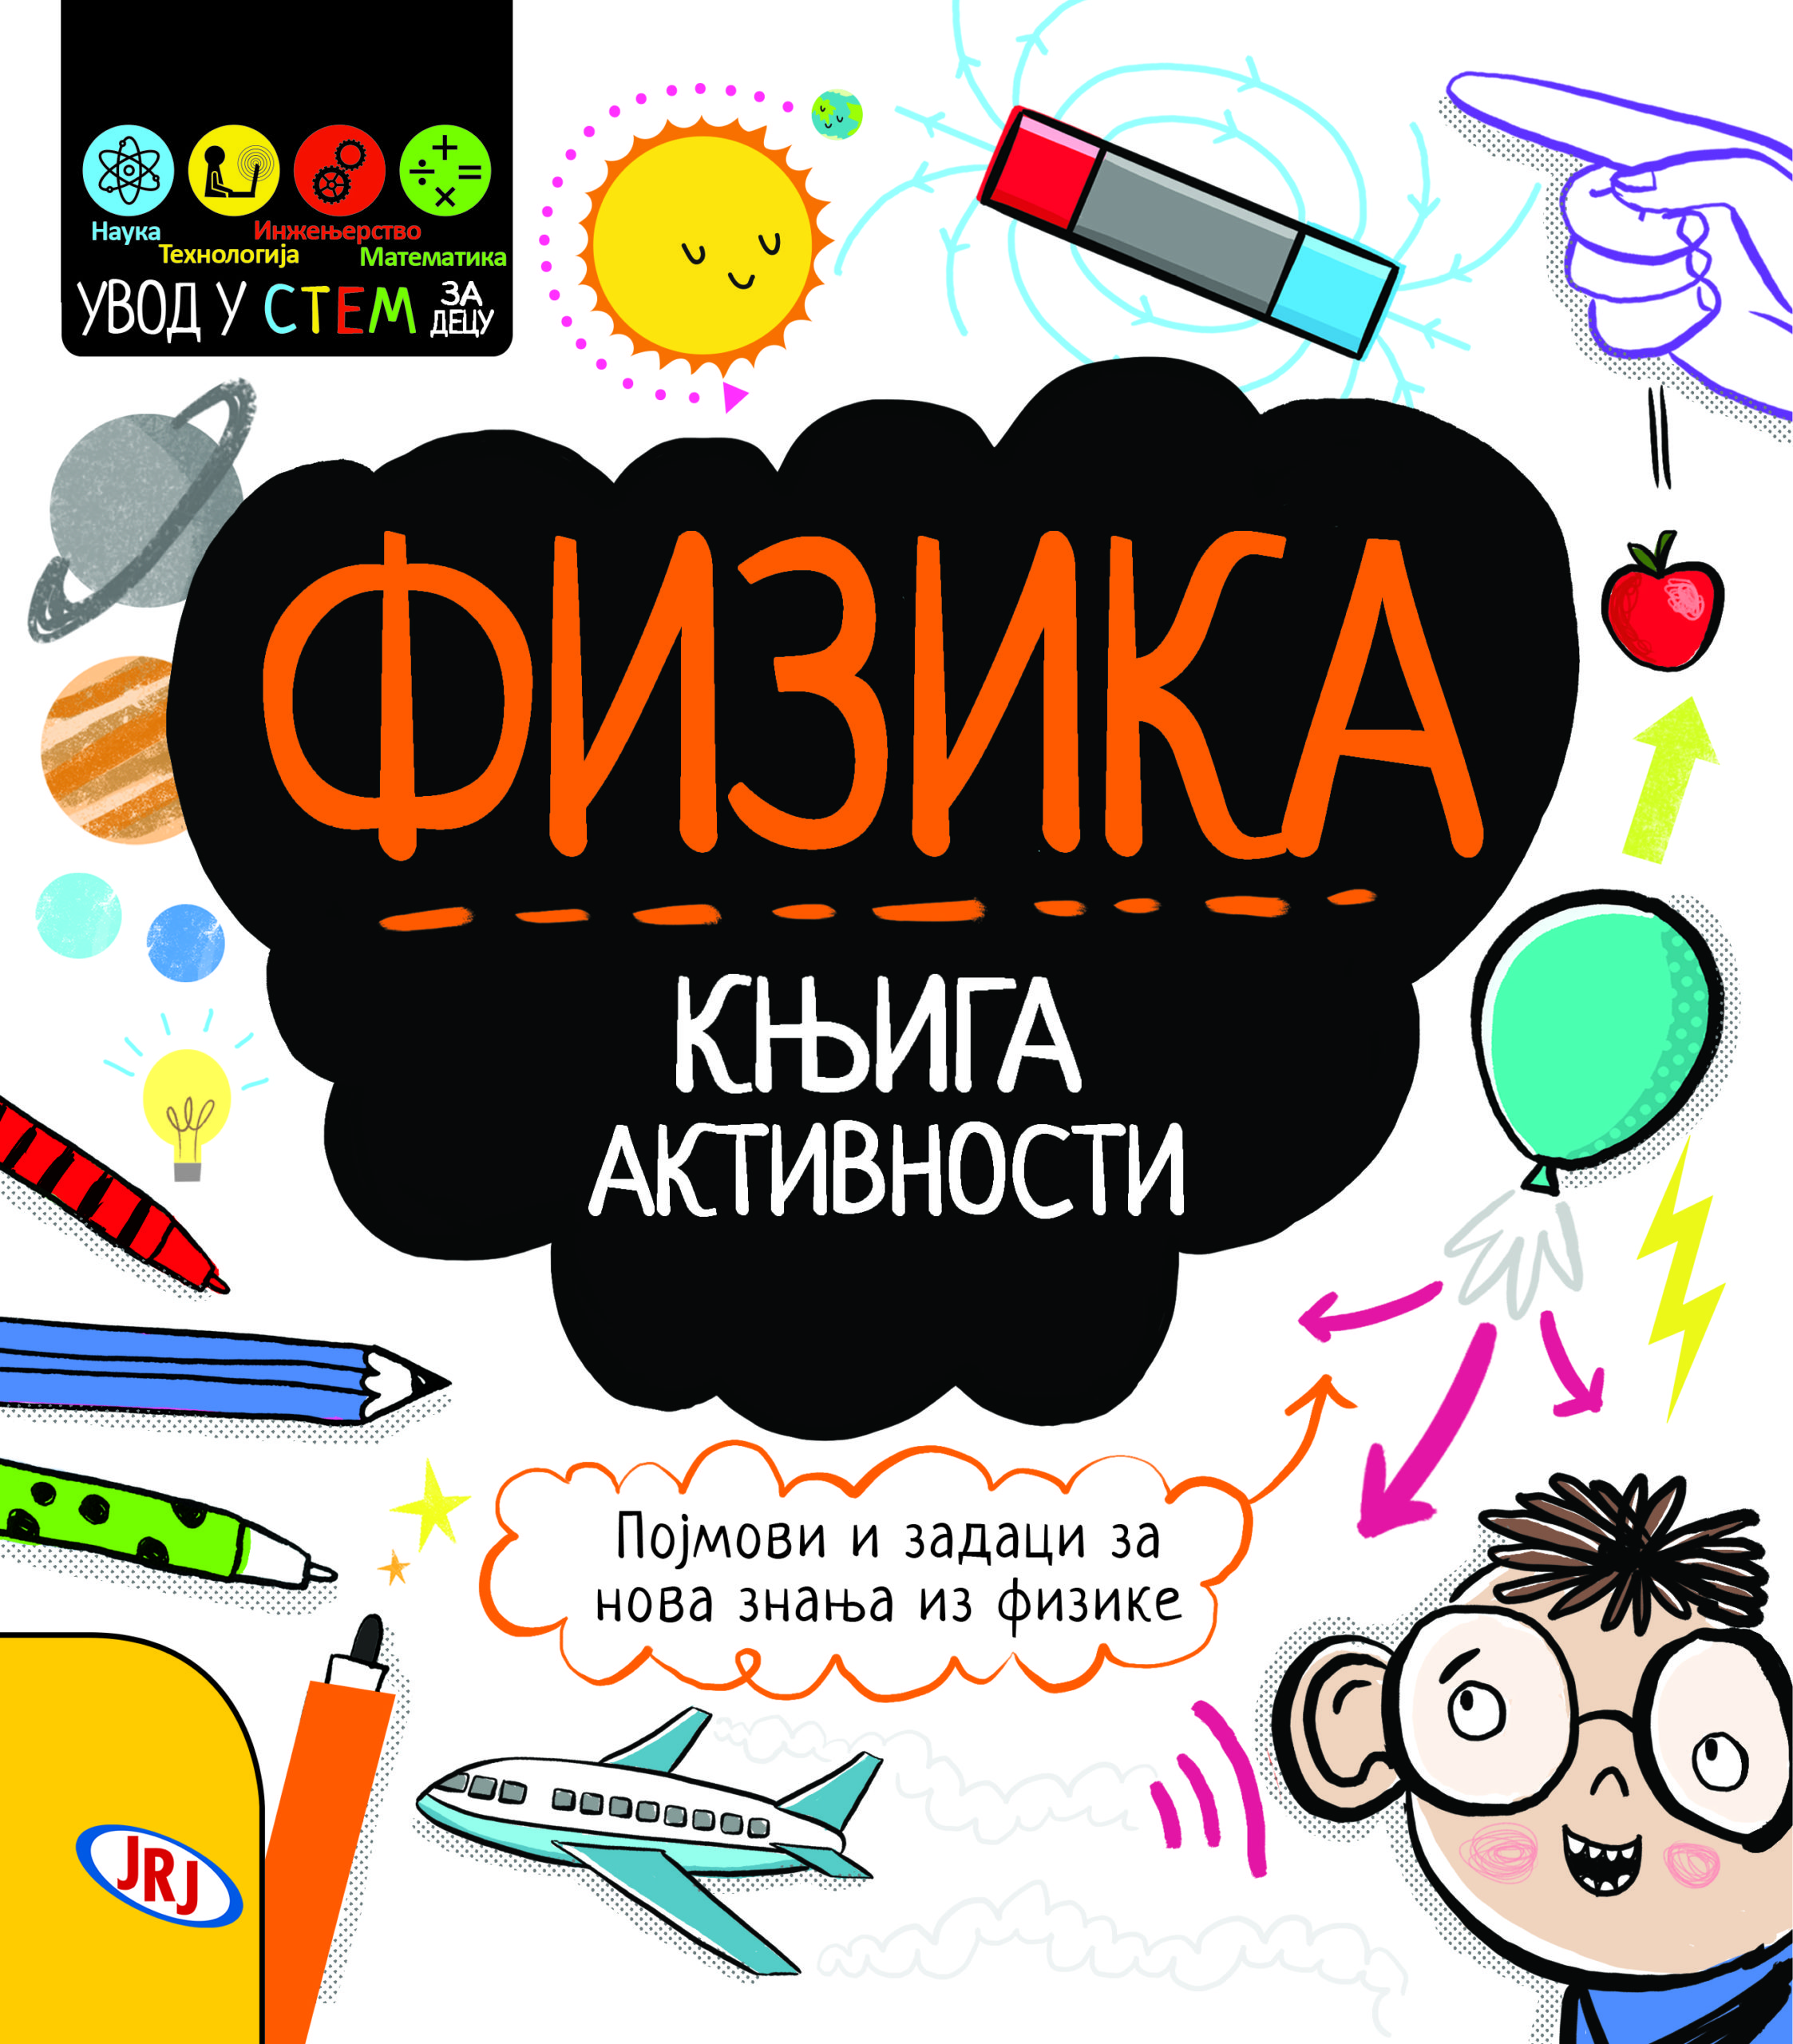 Fizika - knjiga aktivnosti